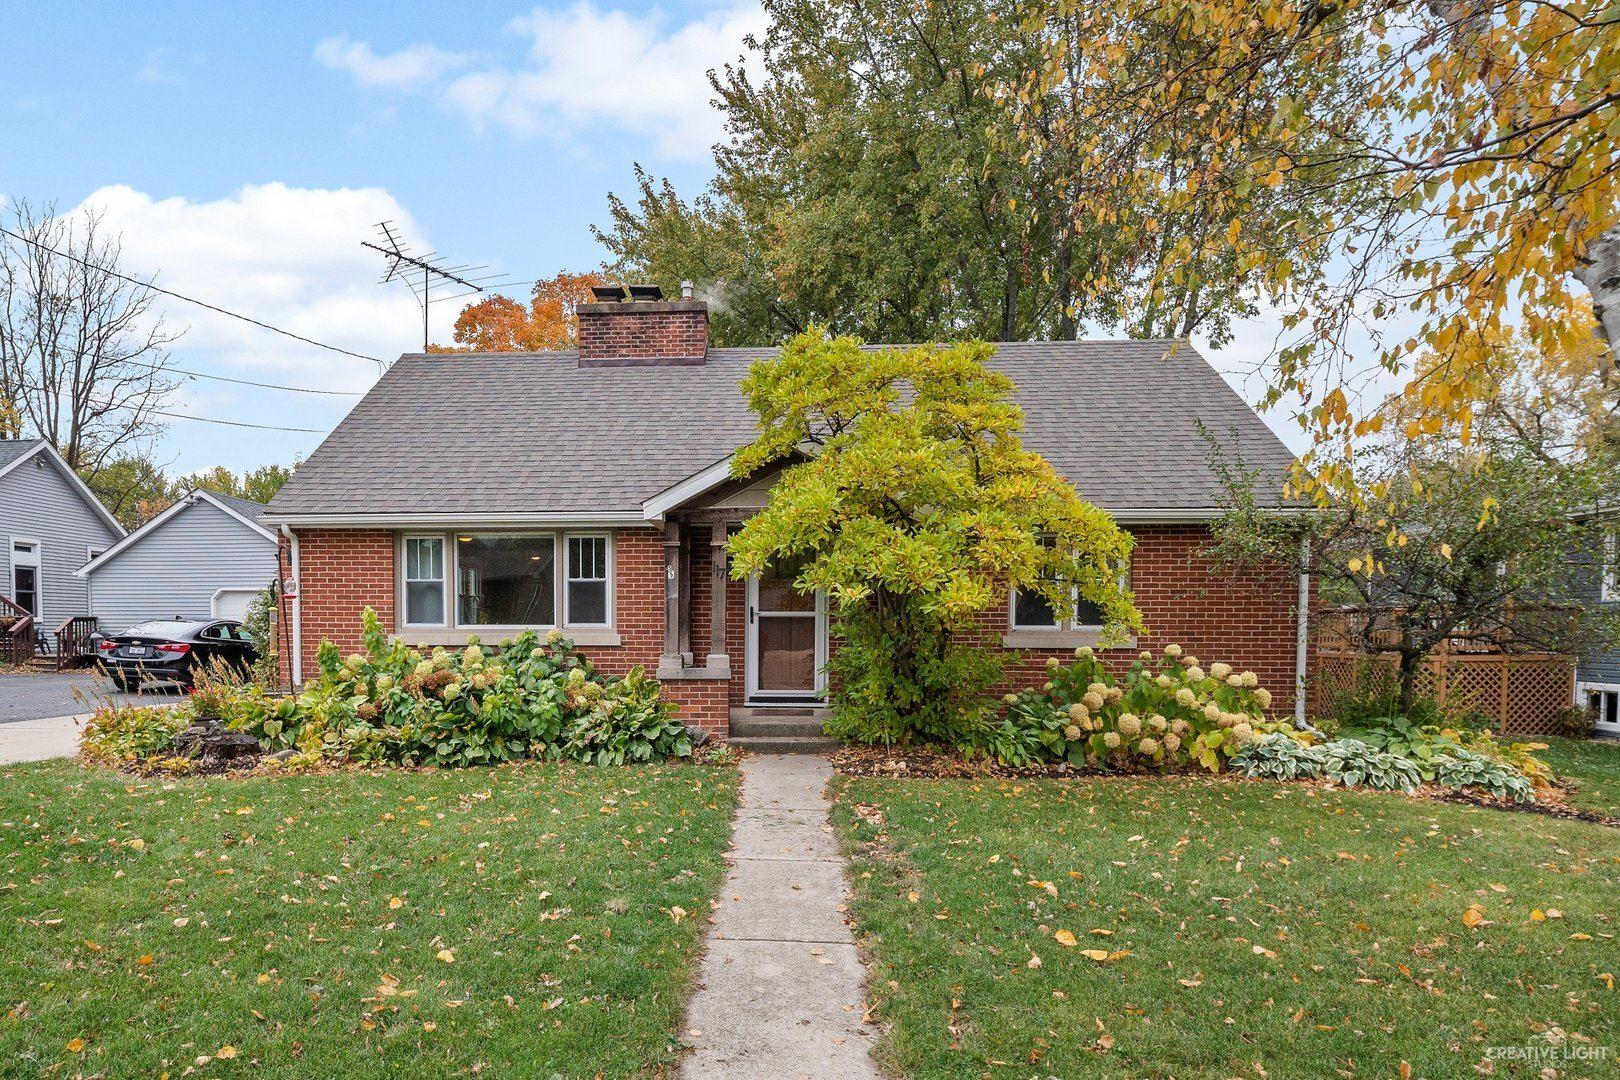 Photo of 117 E Tyler Street, Oswego, IL 60543 (MLS # 10945758)